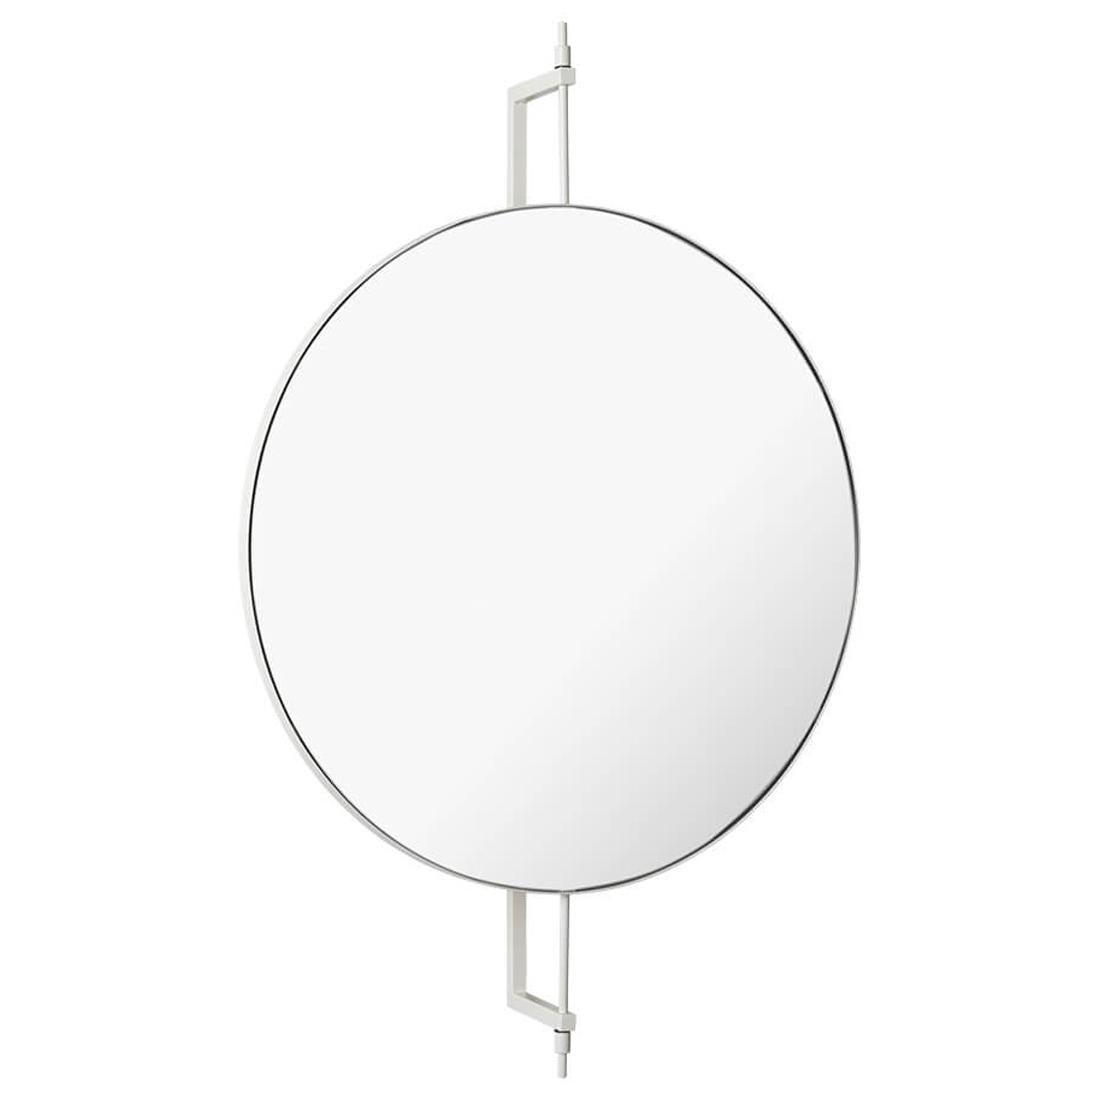 Black Circle Rotating Mirror by Kristina Dam Studio